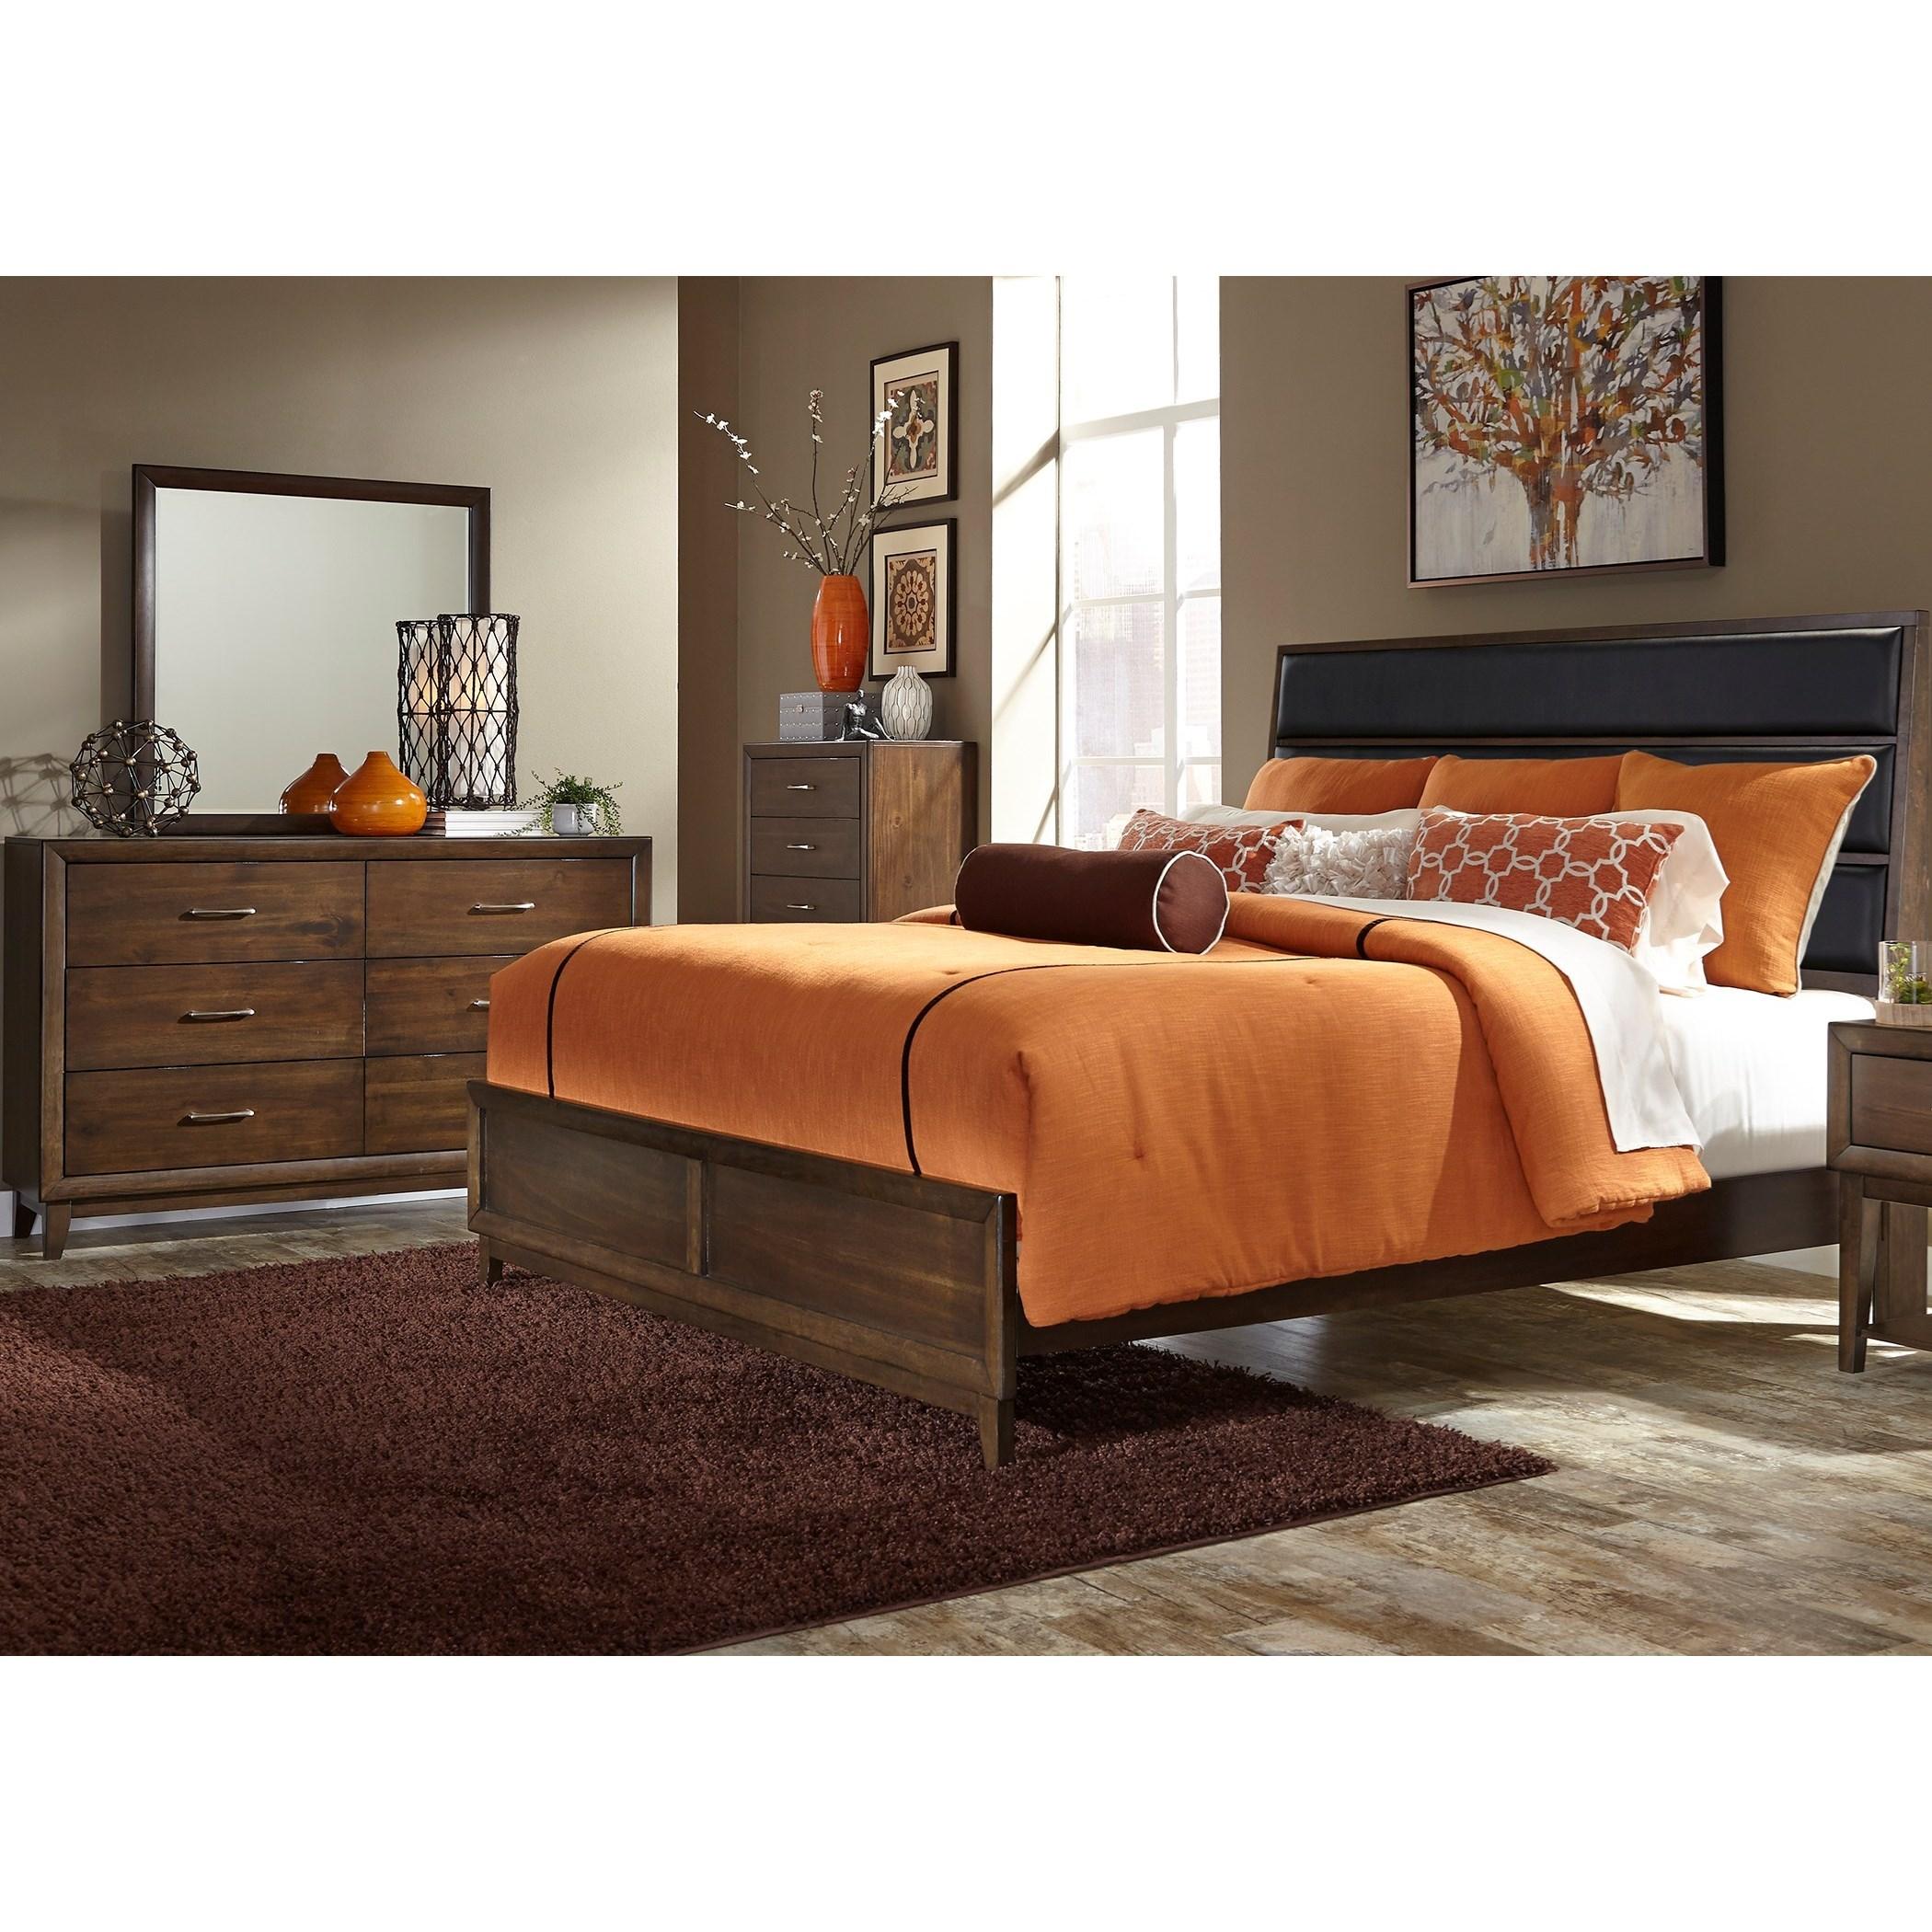 Liberty Furniture Hudson Square Bedroom King Bedroom Group - Item Number: 365-BR-KUBDMC